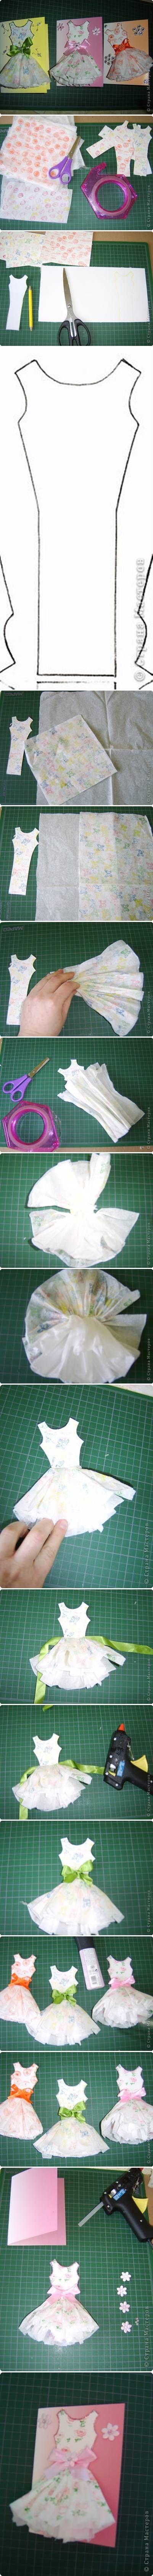 DIY Paper Dress Card Topper DIY Projects